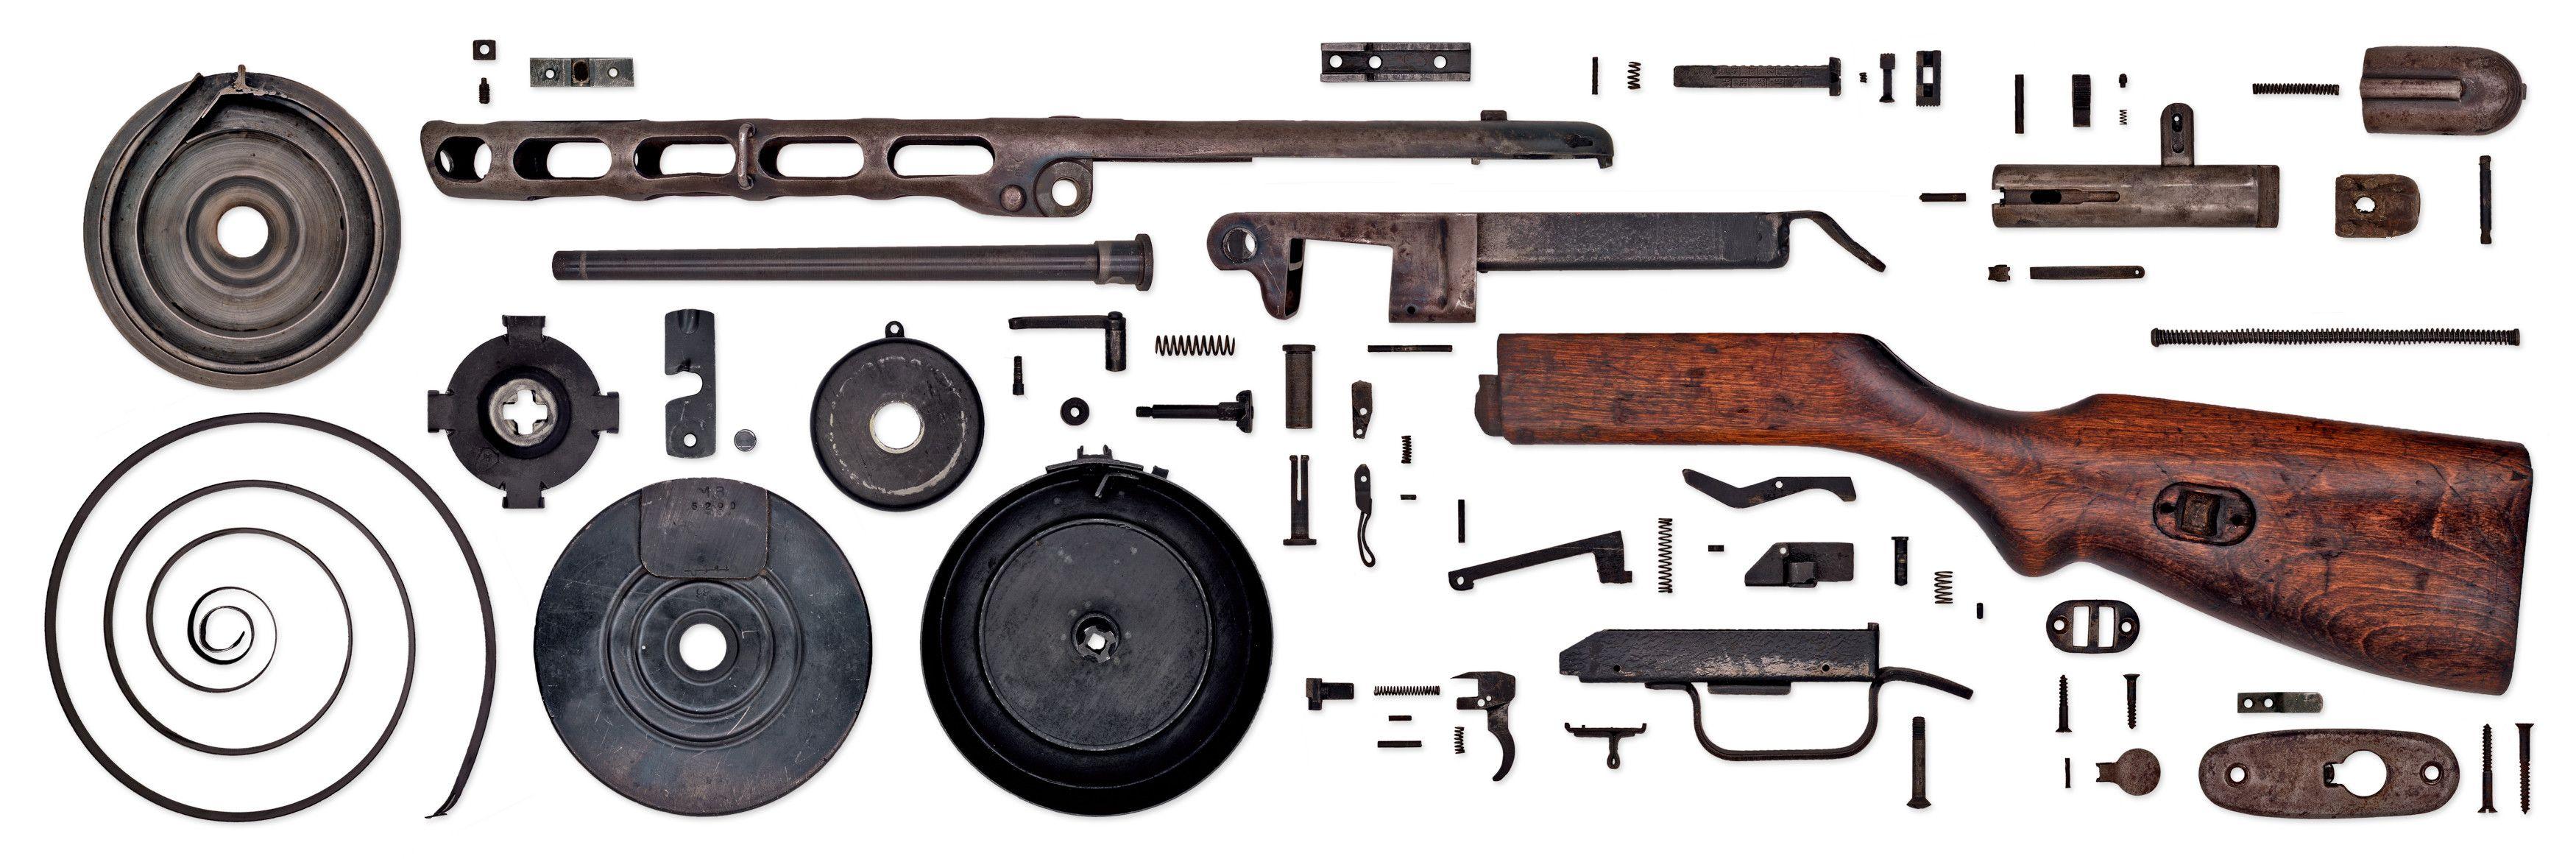 Anatomy: PPSH-41 submachine gun - Imgur | Guns | Pinterest ...